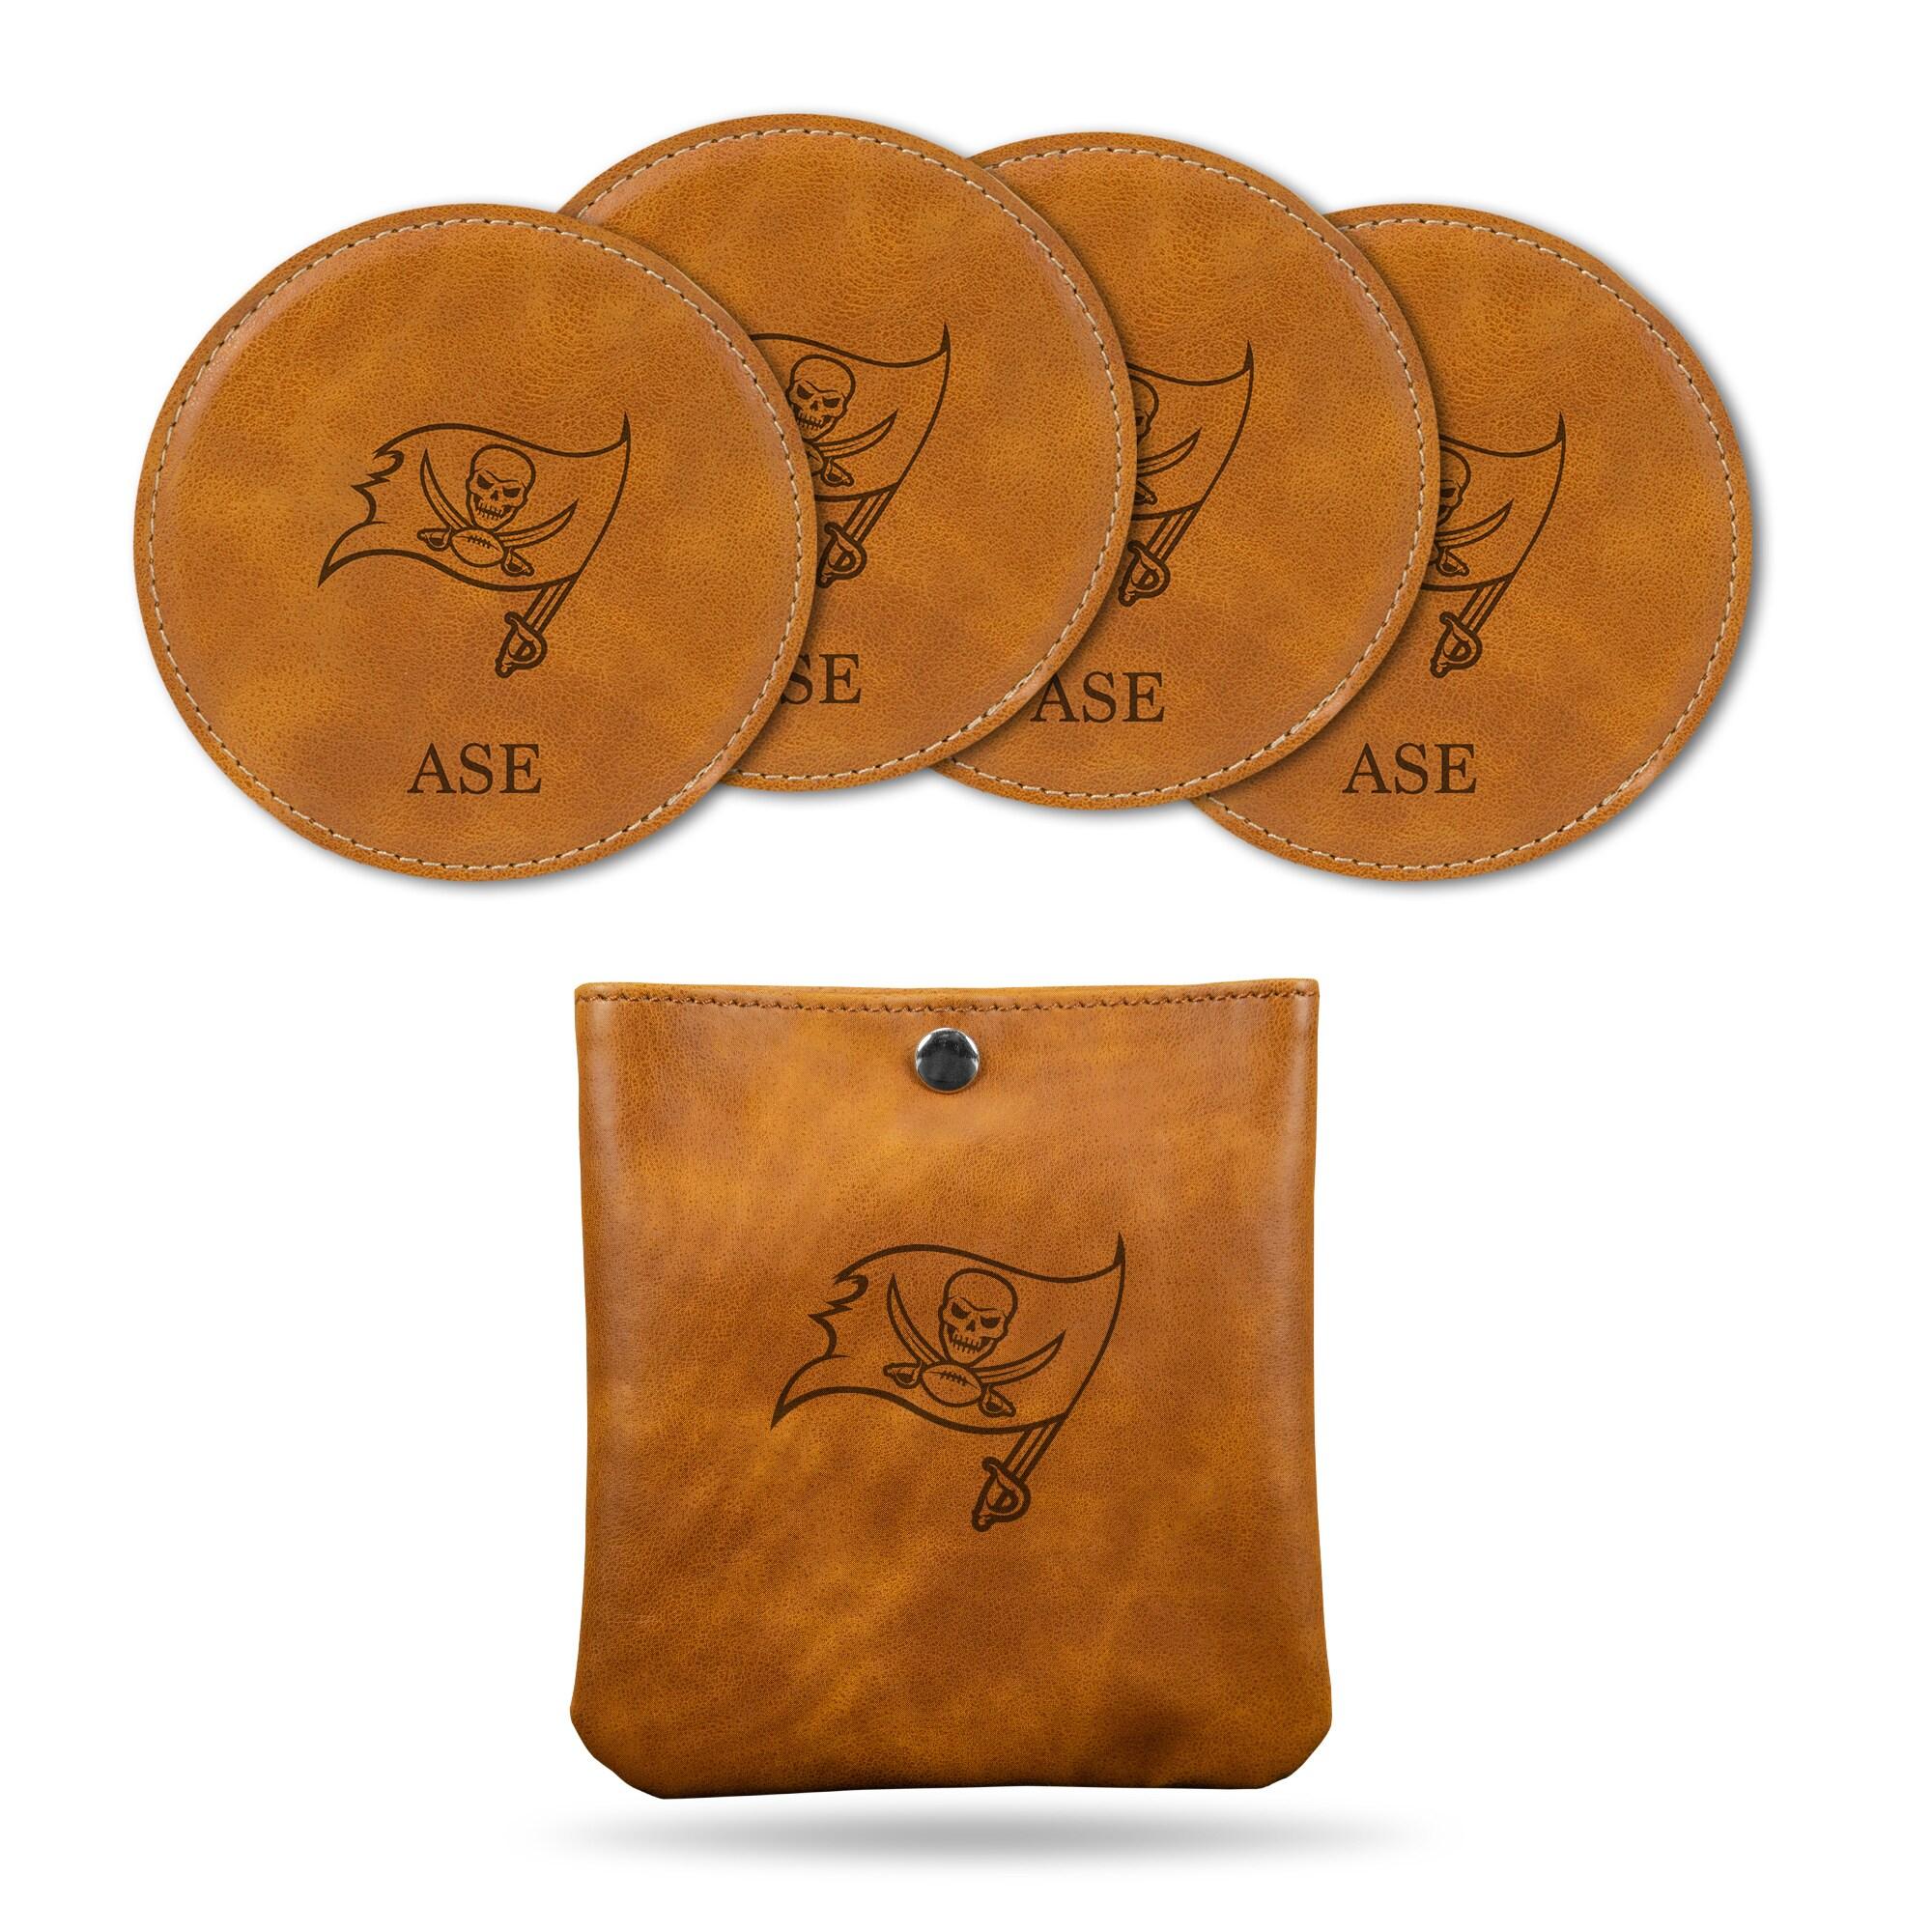 Tampa Bay Buccaneers Sparo 4-Pack Personalized Coaster Set - Brown